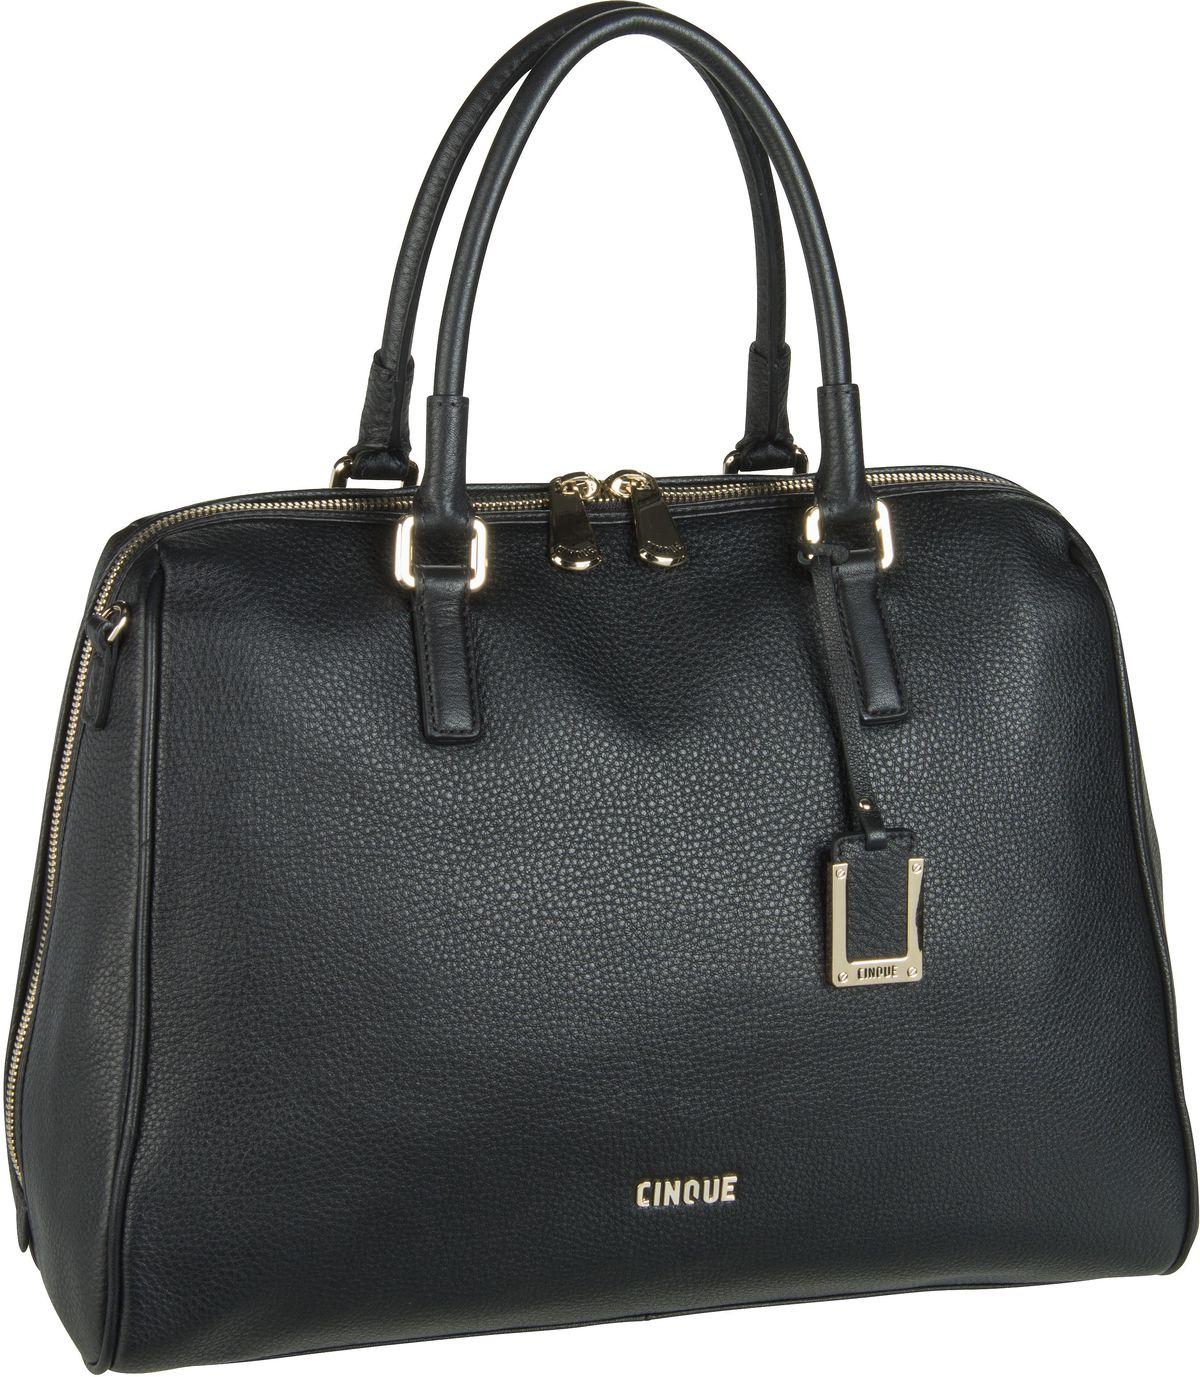 Cinque Handtasche Roberta 11828 Schwarz